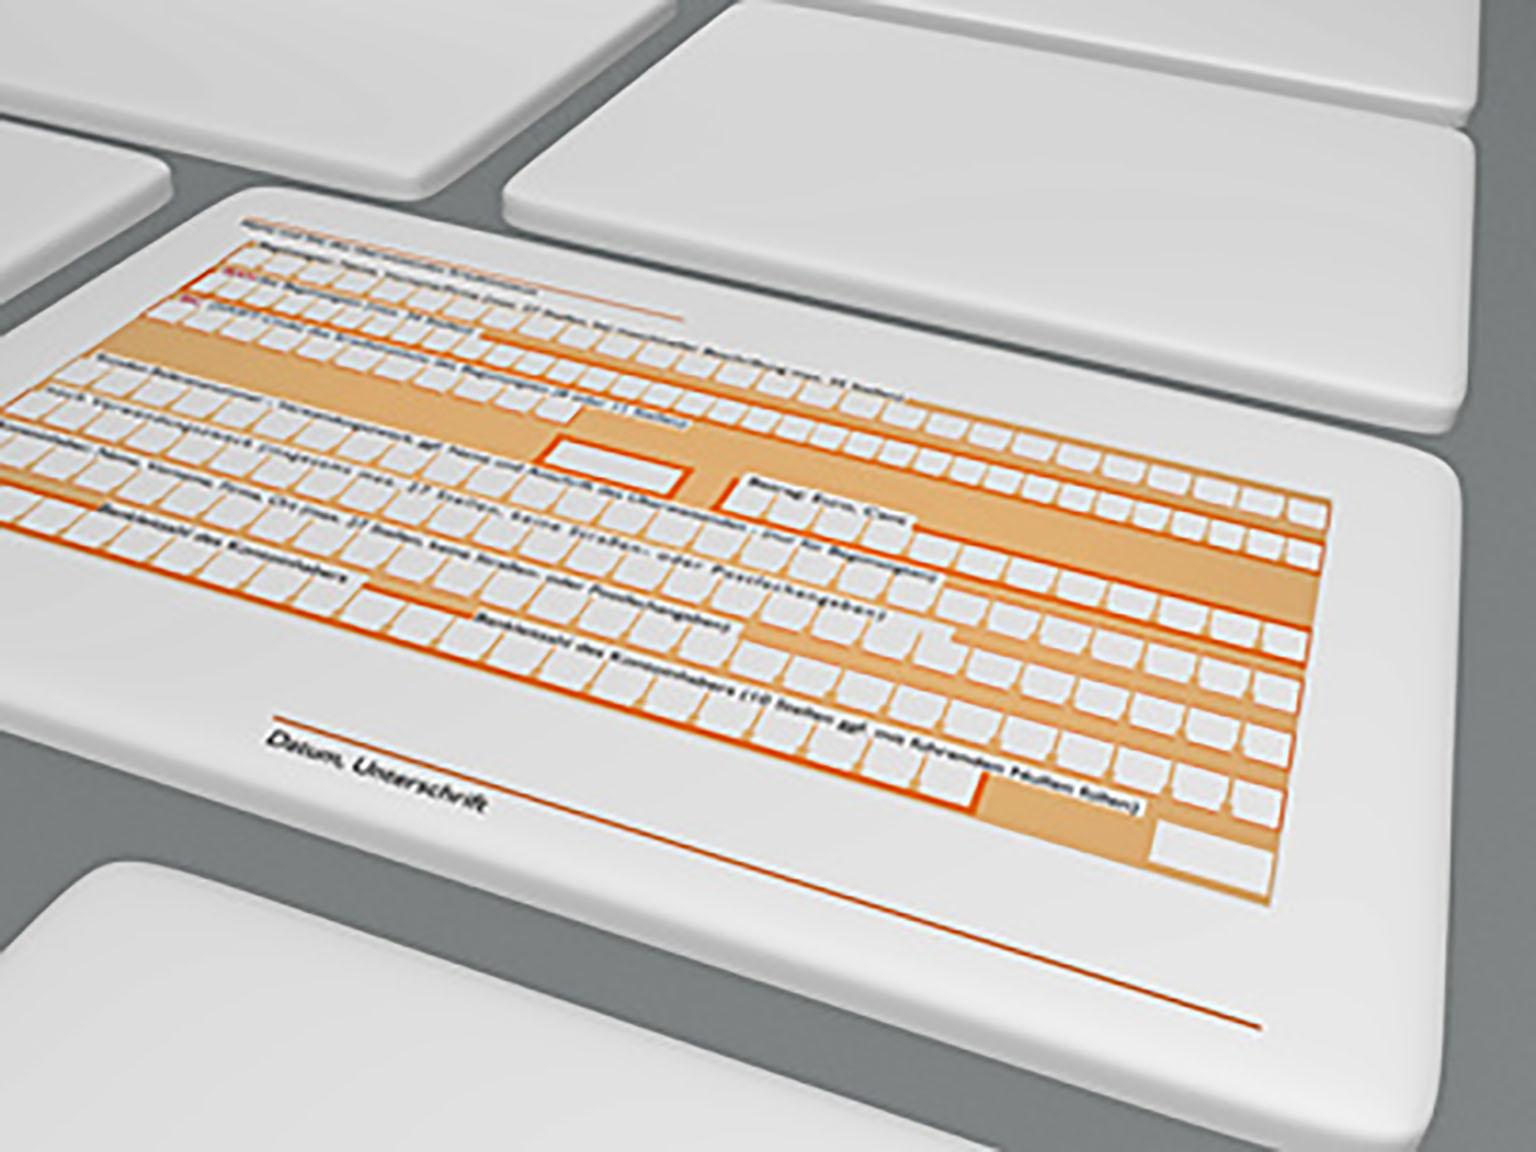 laptop keyboard illustration